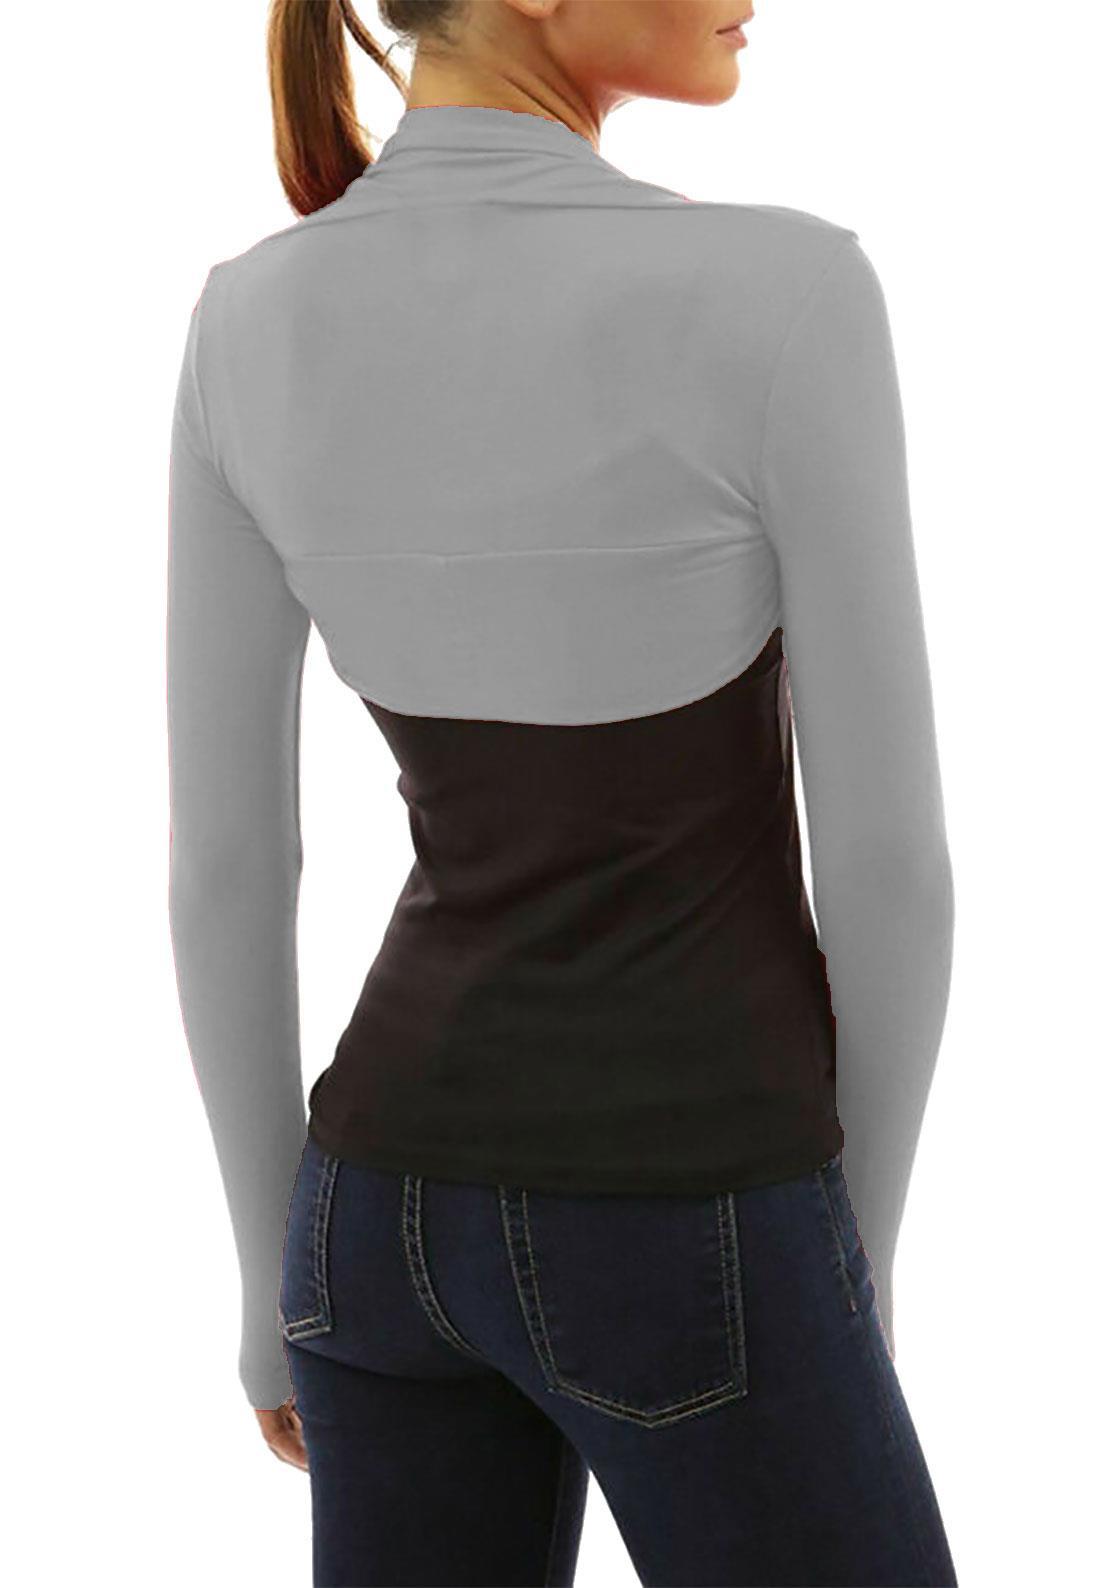 Ladies Long Sleeves Cropped Bolero Womens Stretchy Plain Shrug